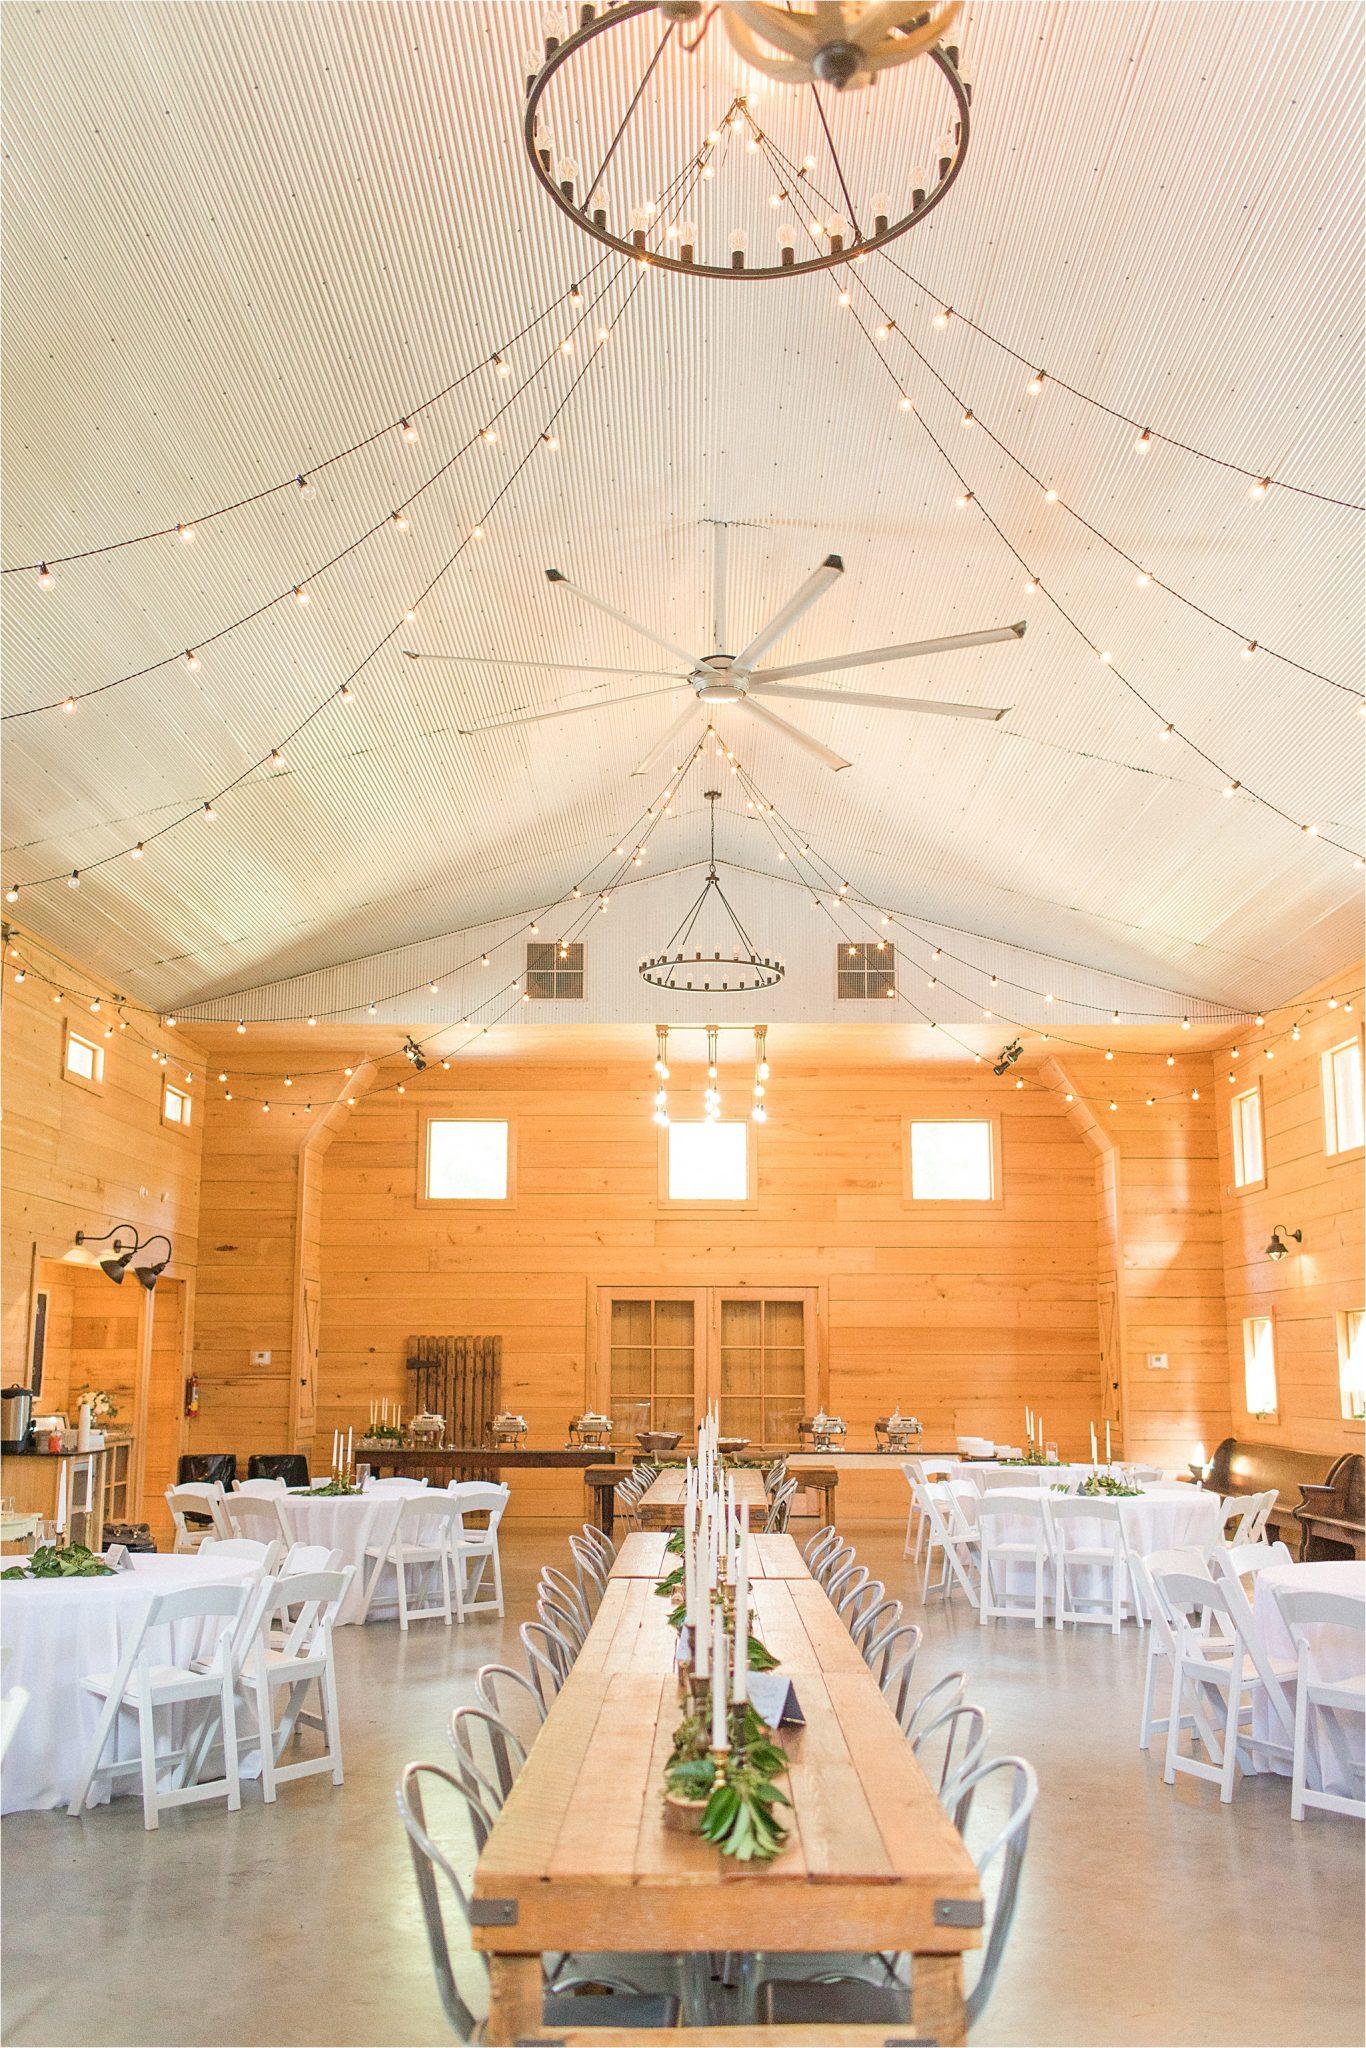 wedding-reception-alabama-venue-barn-farm-tables-metal-chairs-candle-centerpieces-shiplap